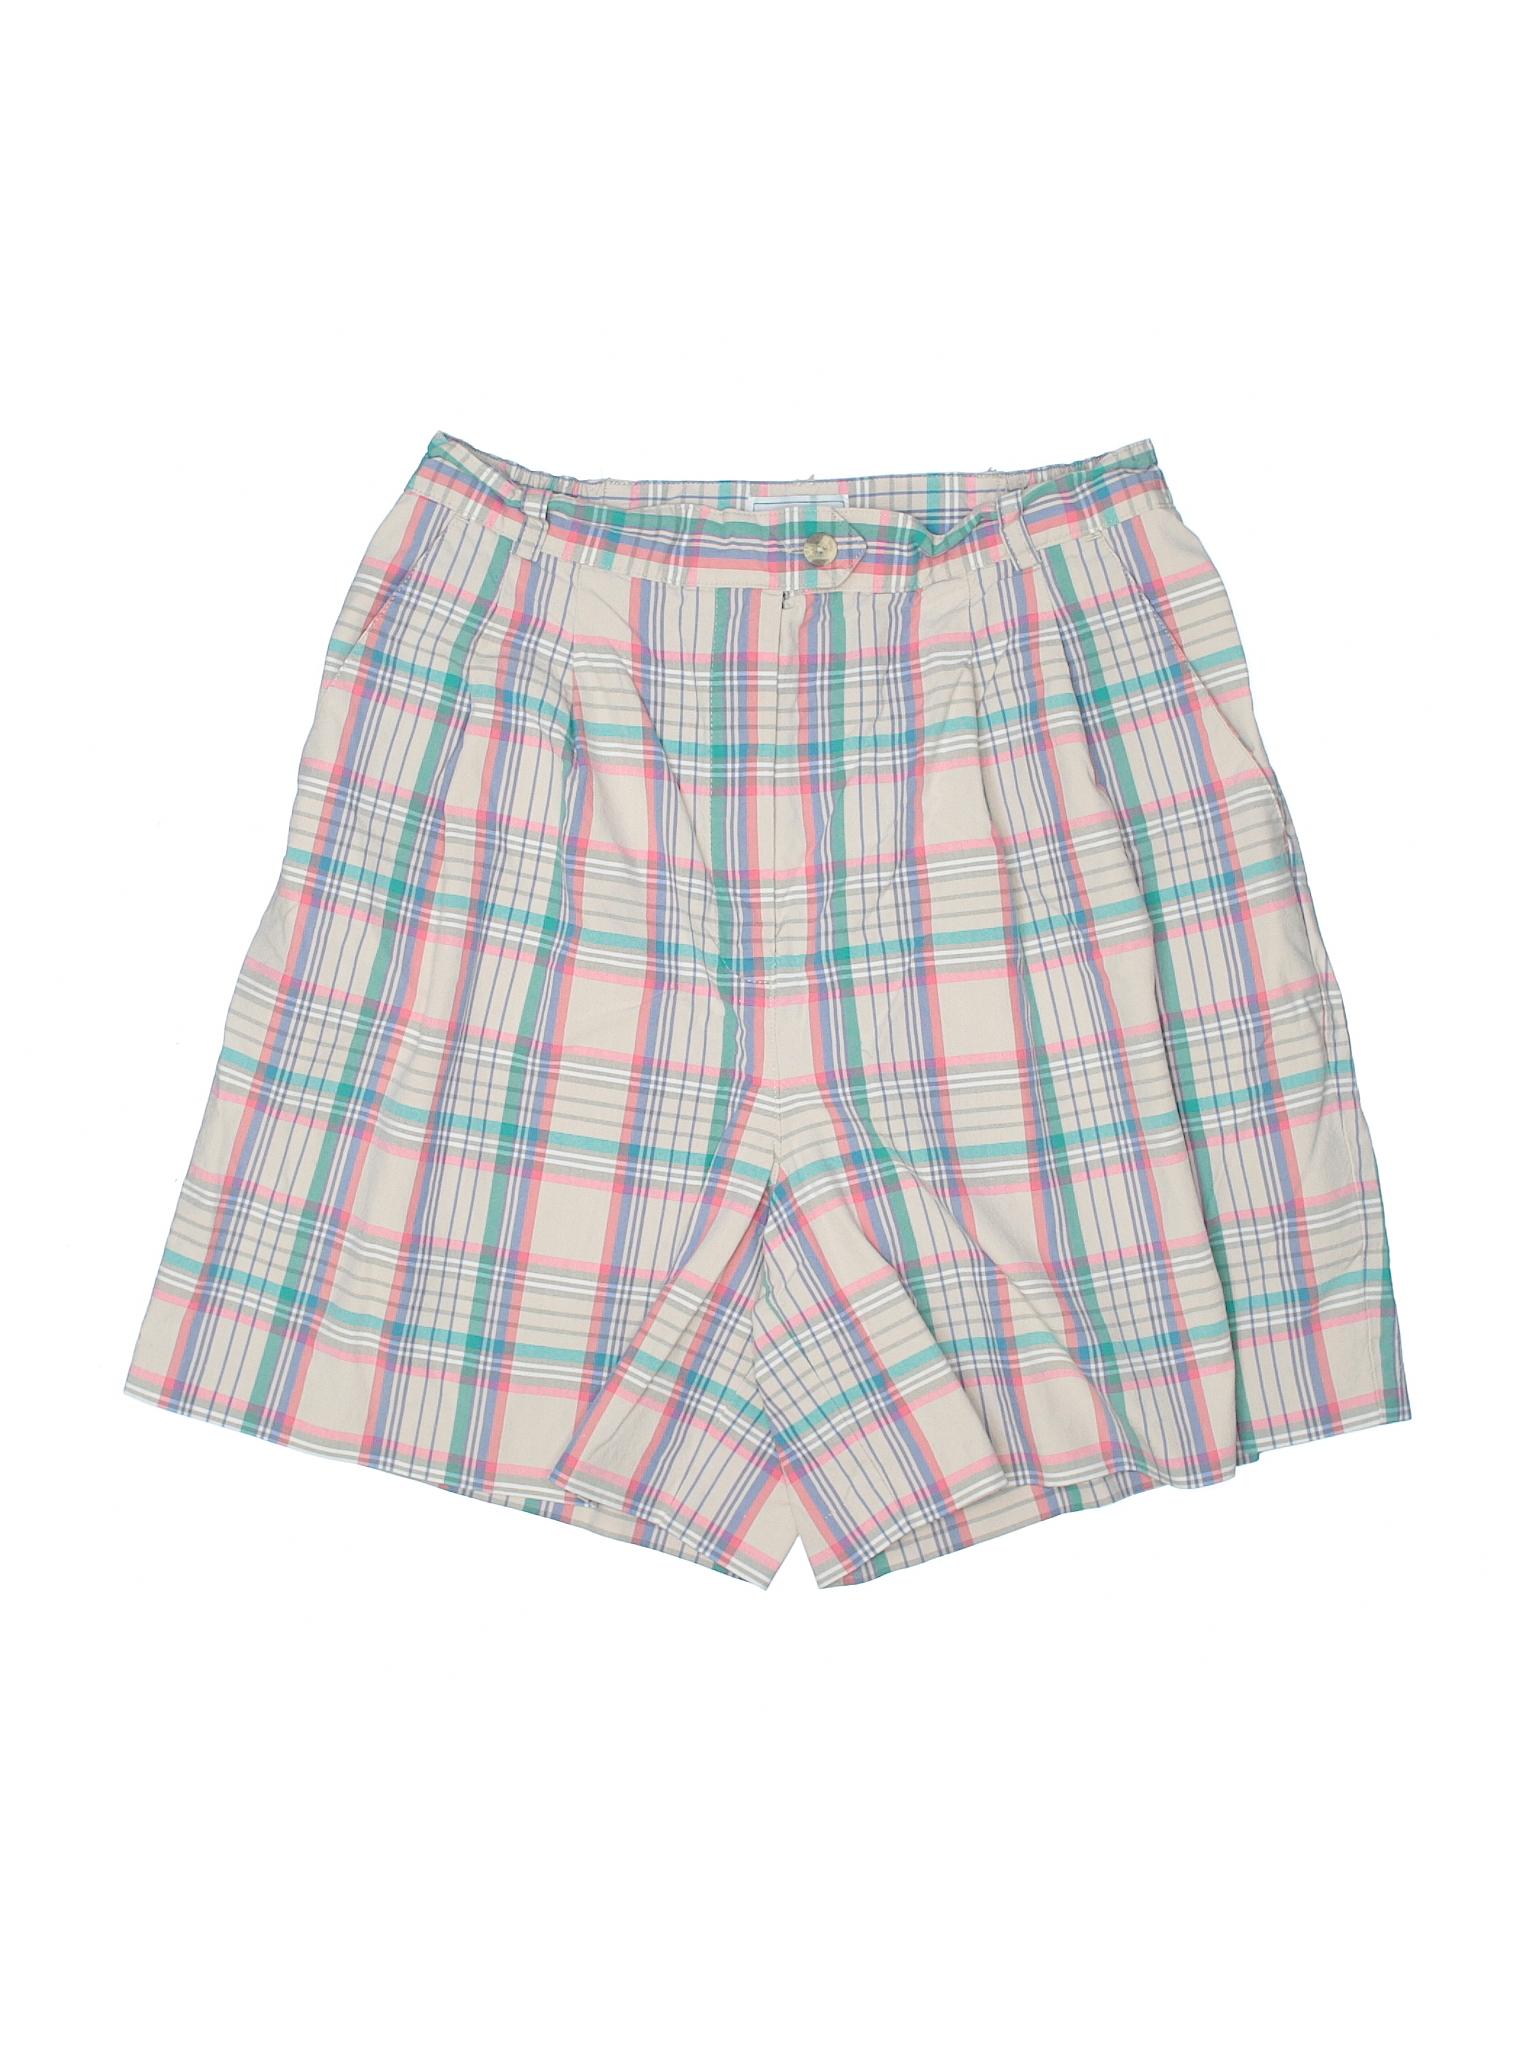 Boutique Boutique Shorts IZOD IZOD IZOD Shorts Shorts Boutique Boutique XYYrwxnC5q